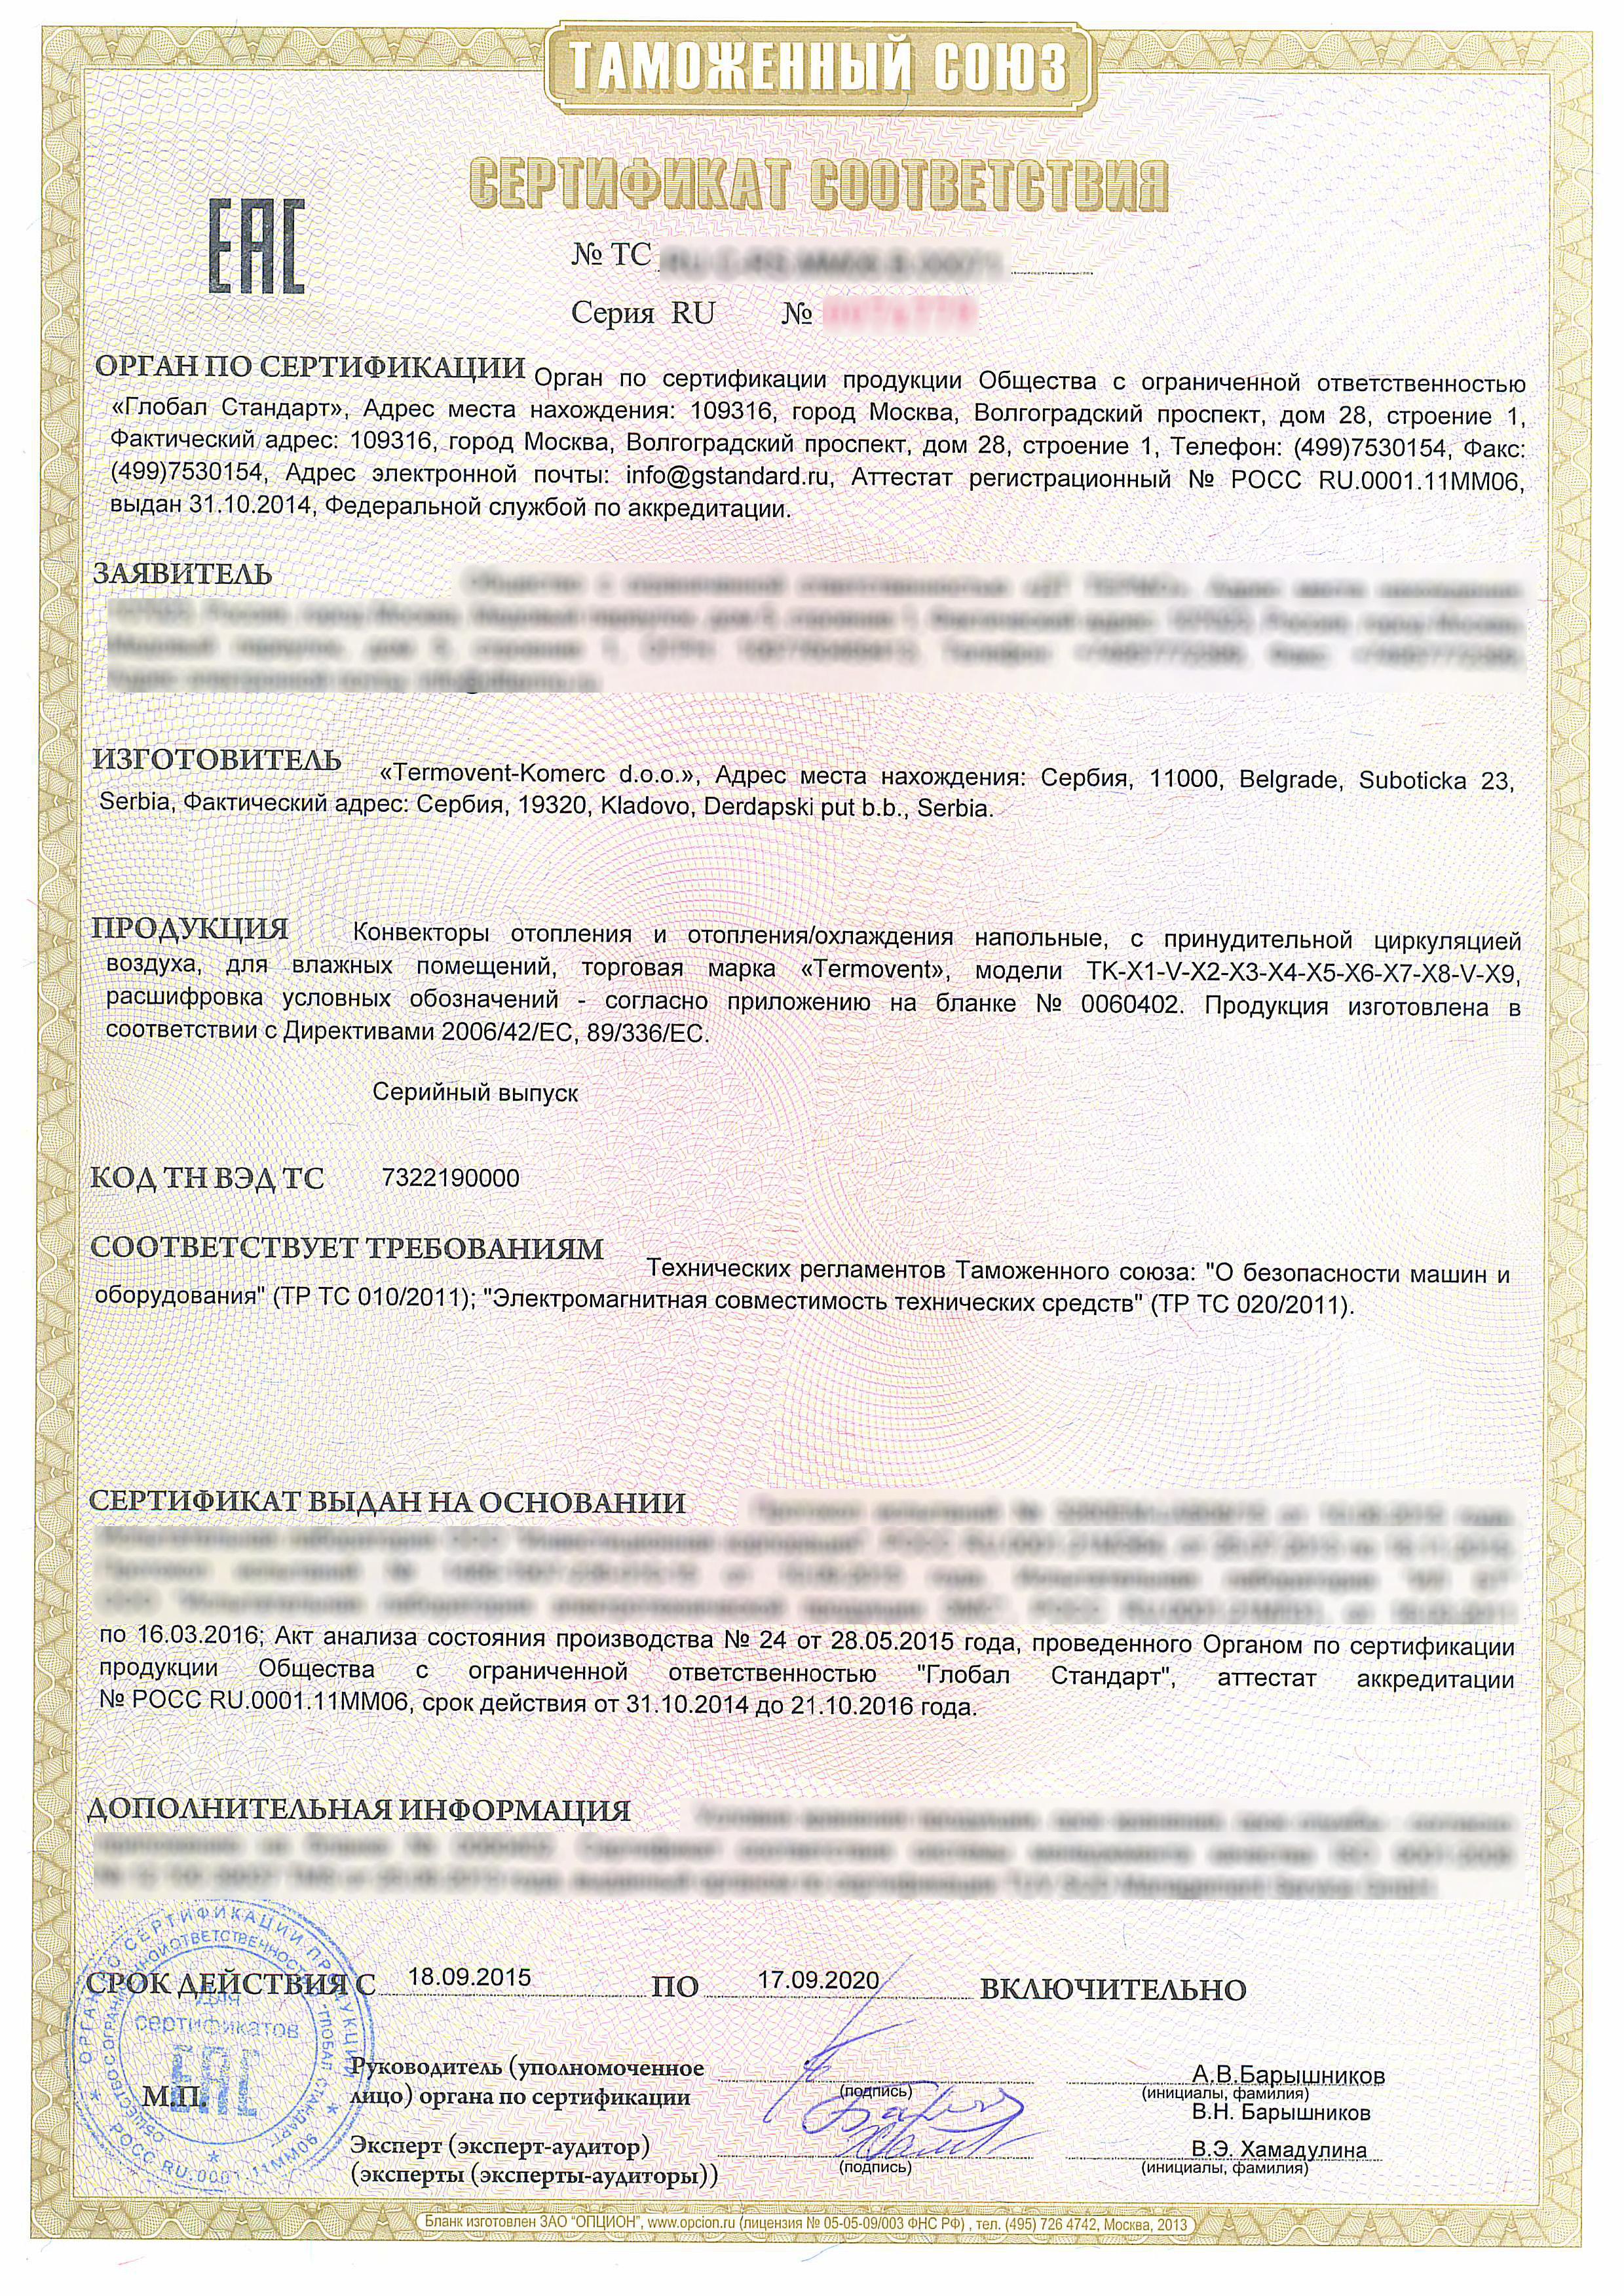 Пример-сертификата-тр-тс-010-2011-тр-тр-020-2011